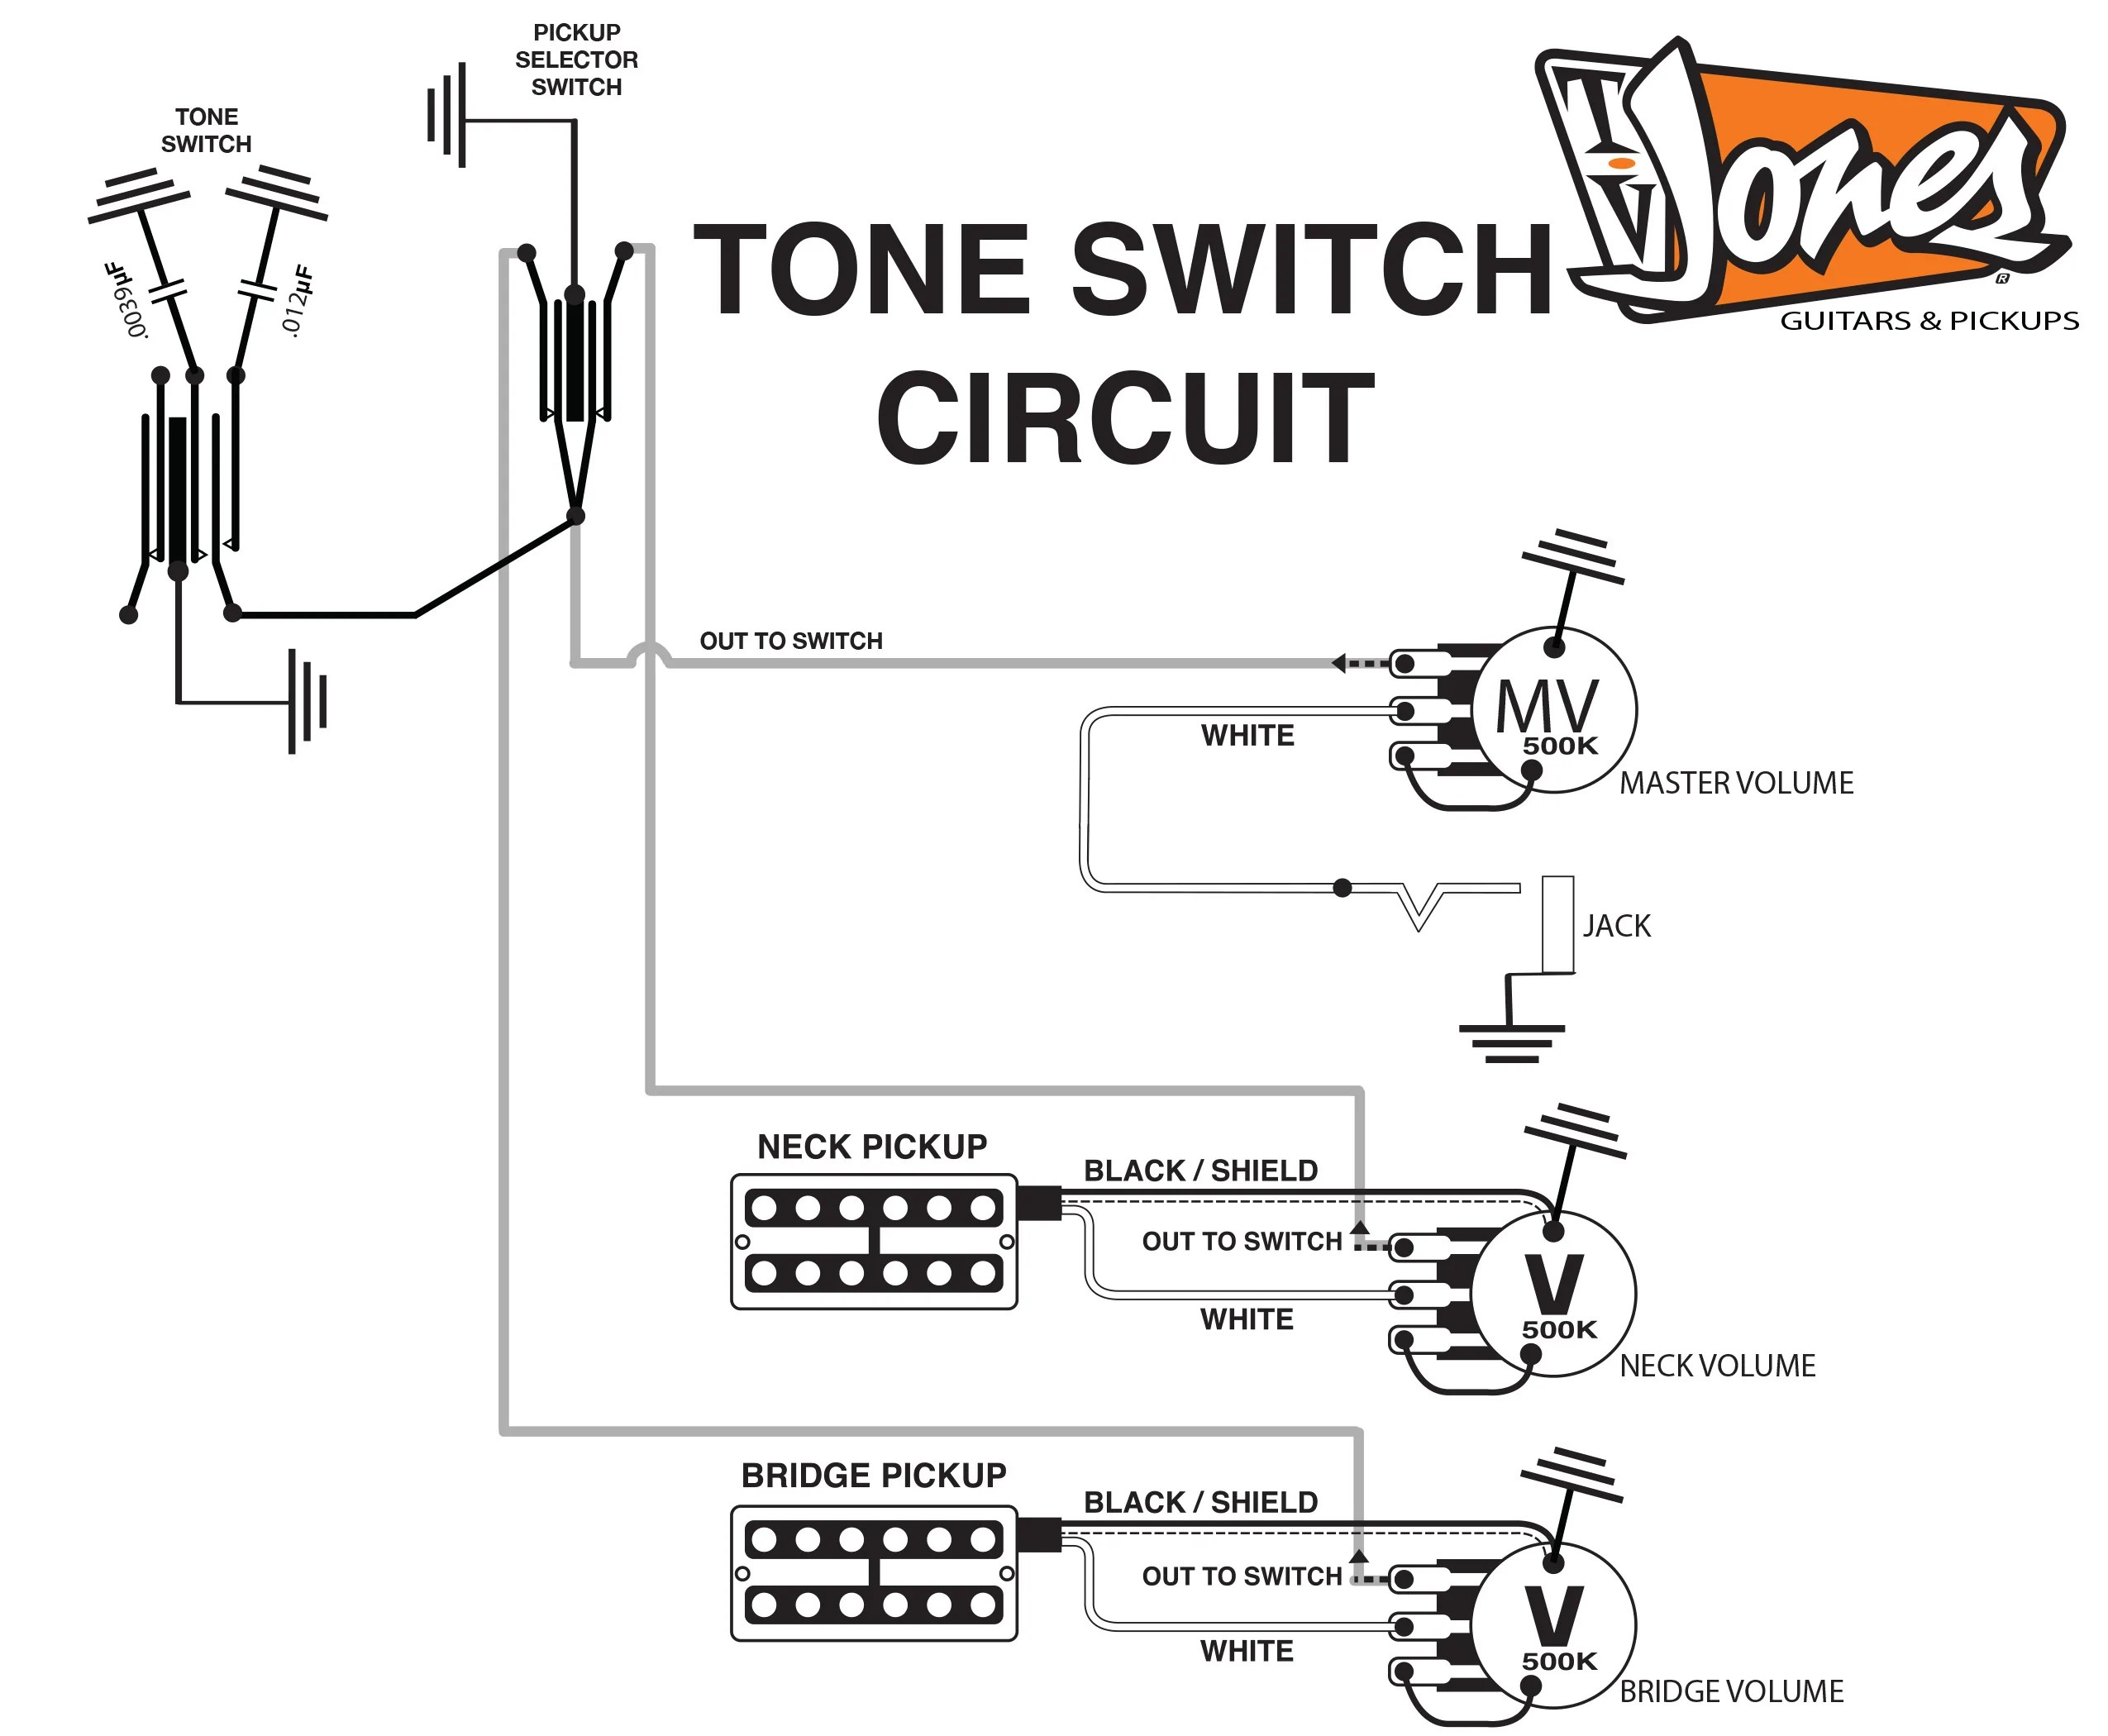 gretsch guitar pick up wiring diagrams wiring diagram third leveltv jones product dimensions gibson 335 wiring [ 2550 x 2100 Pixel ]